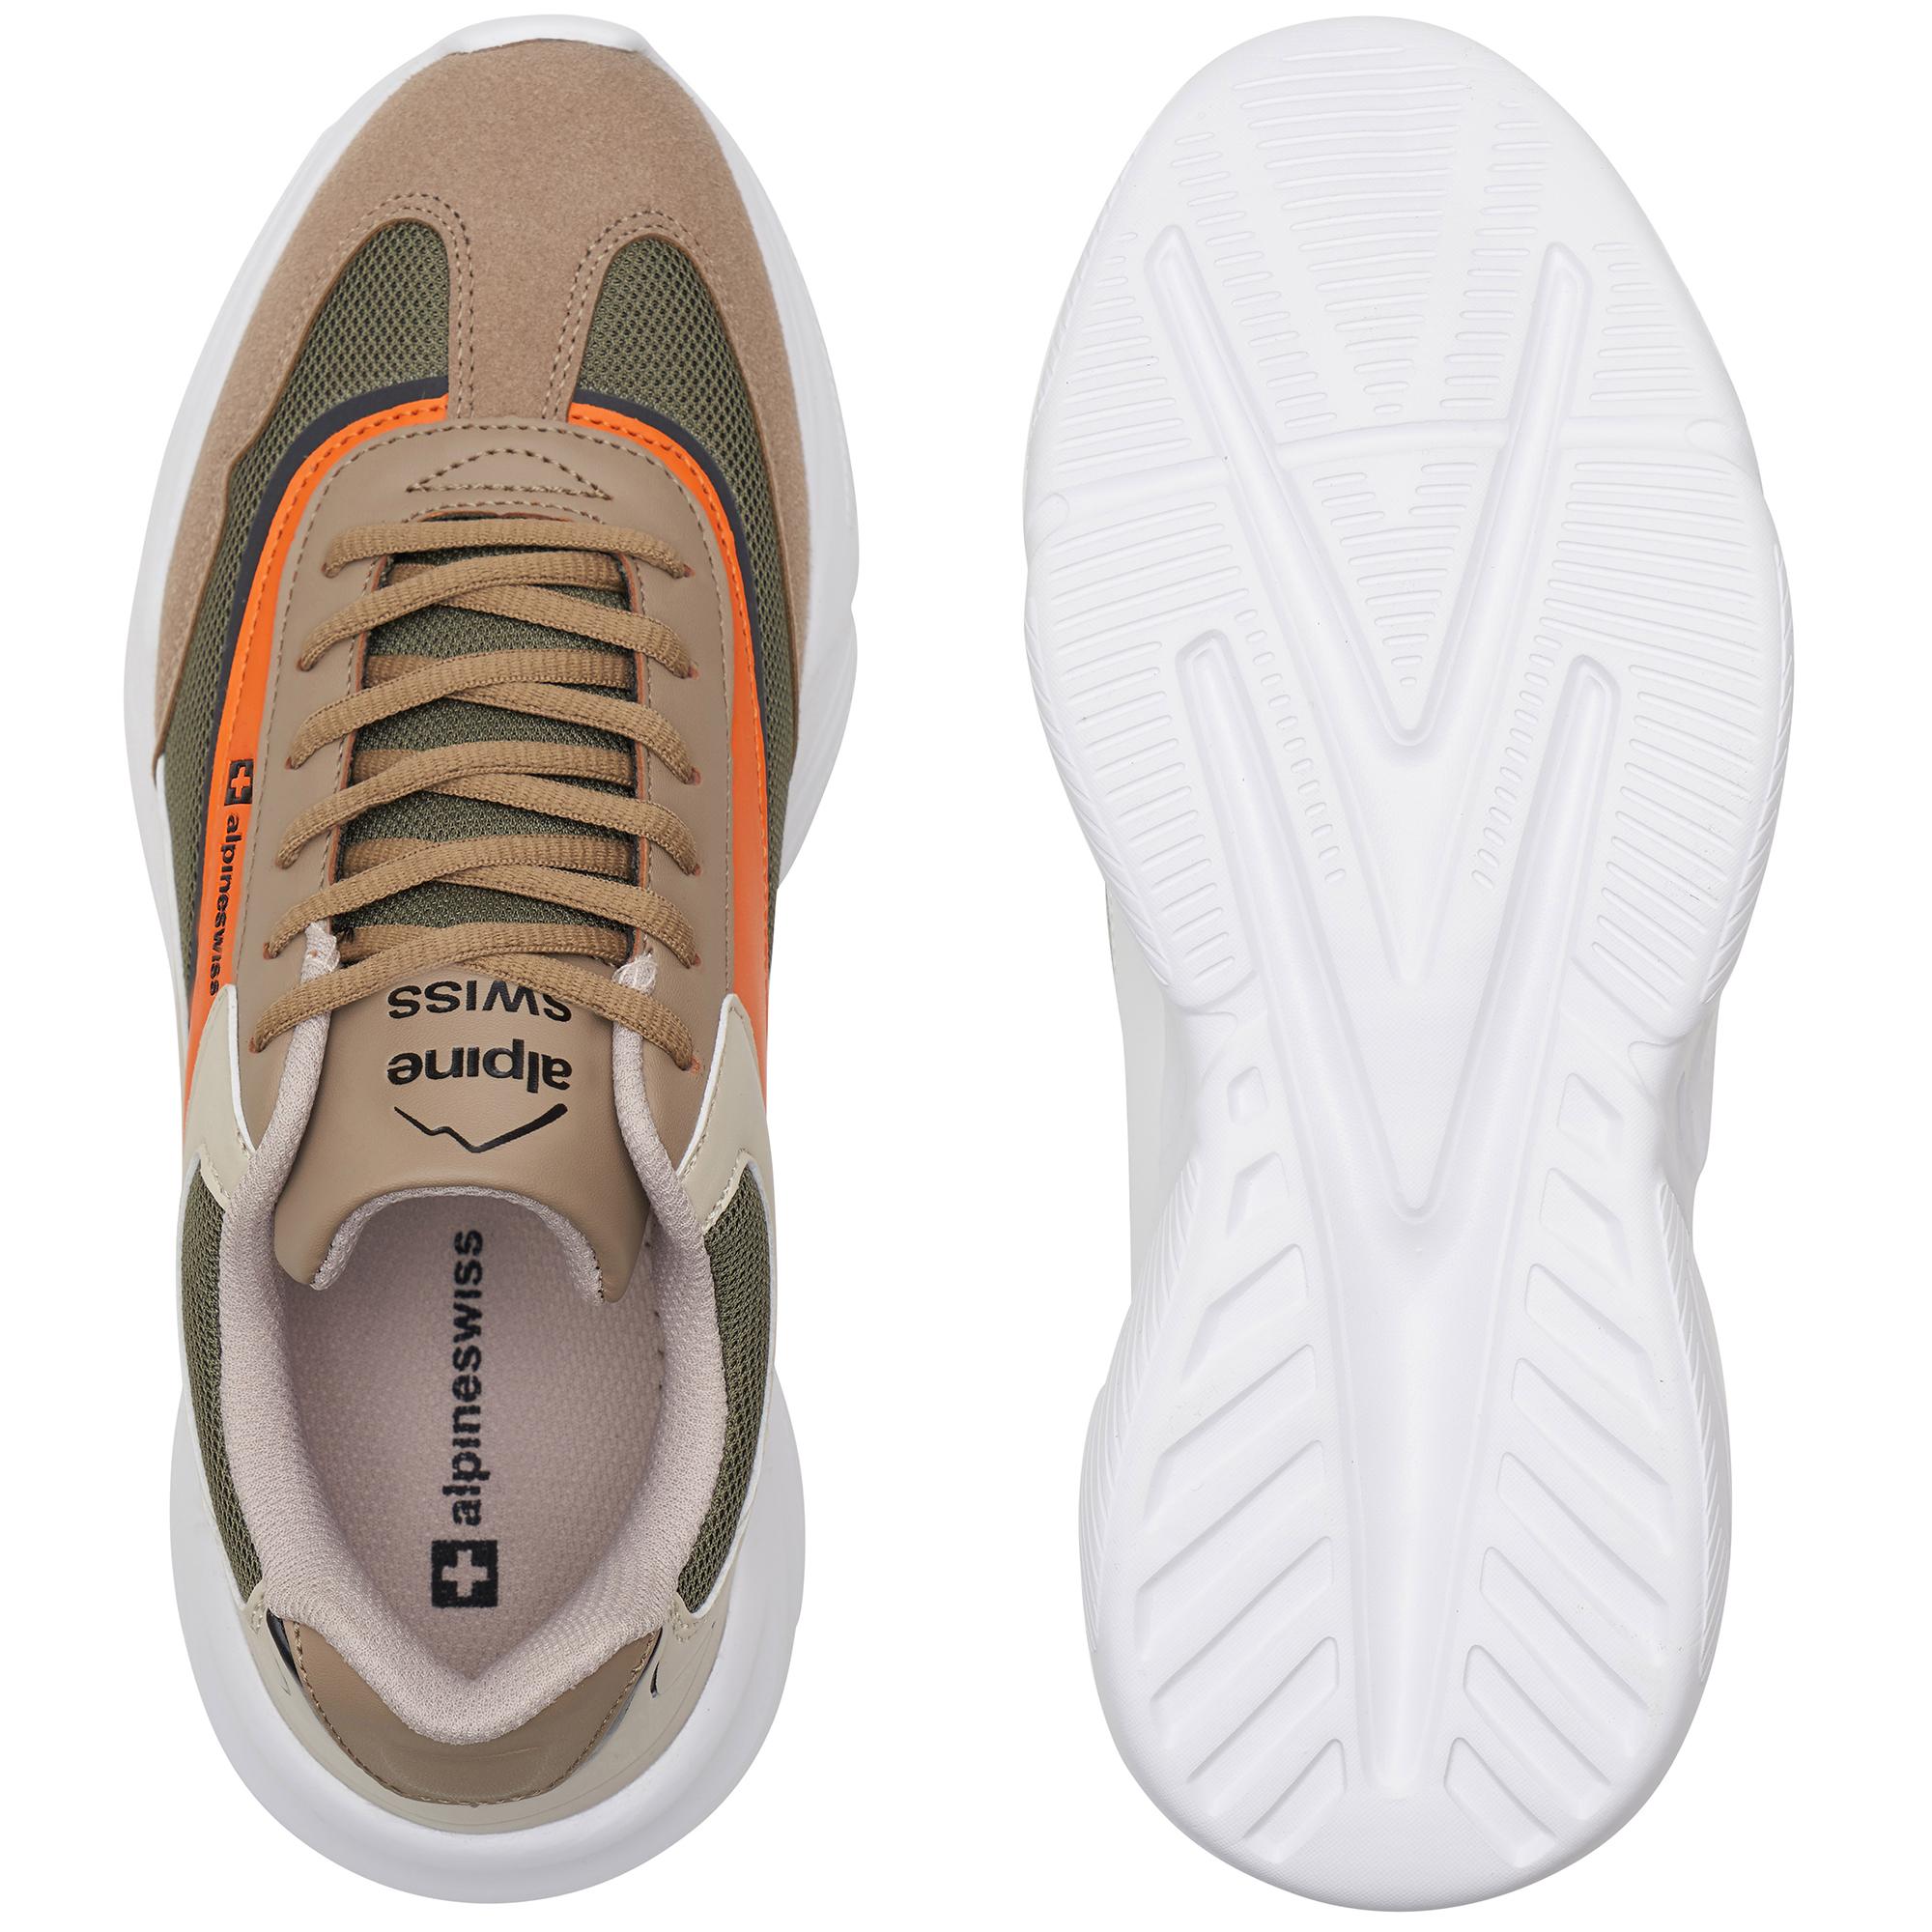 Alpine-Swiss-Stuart-Mens-Chunky-Sneakers-Retro-Platform-Dad-Tennis-Shoes thumbnail 34